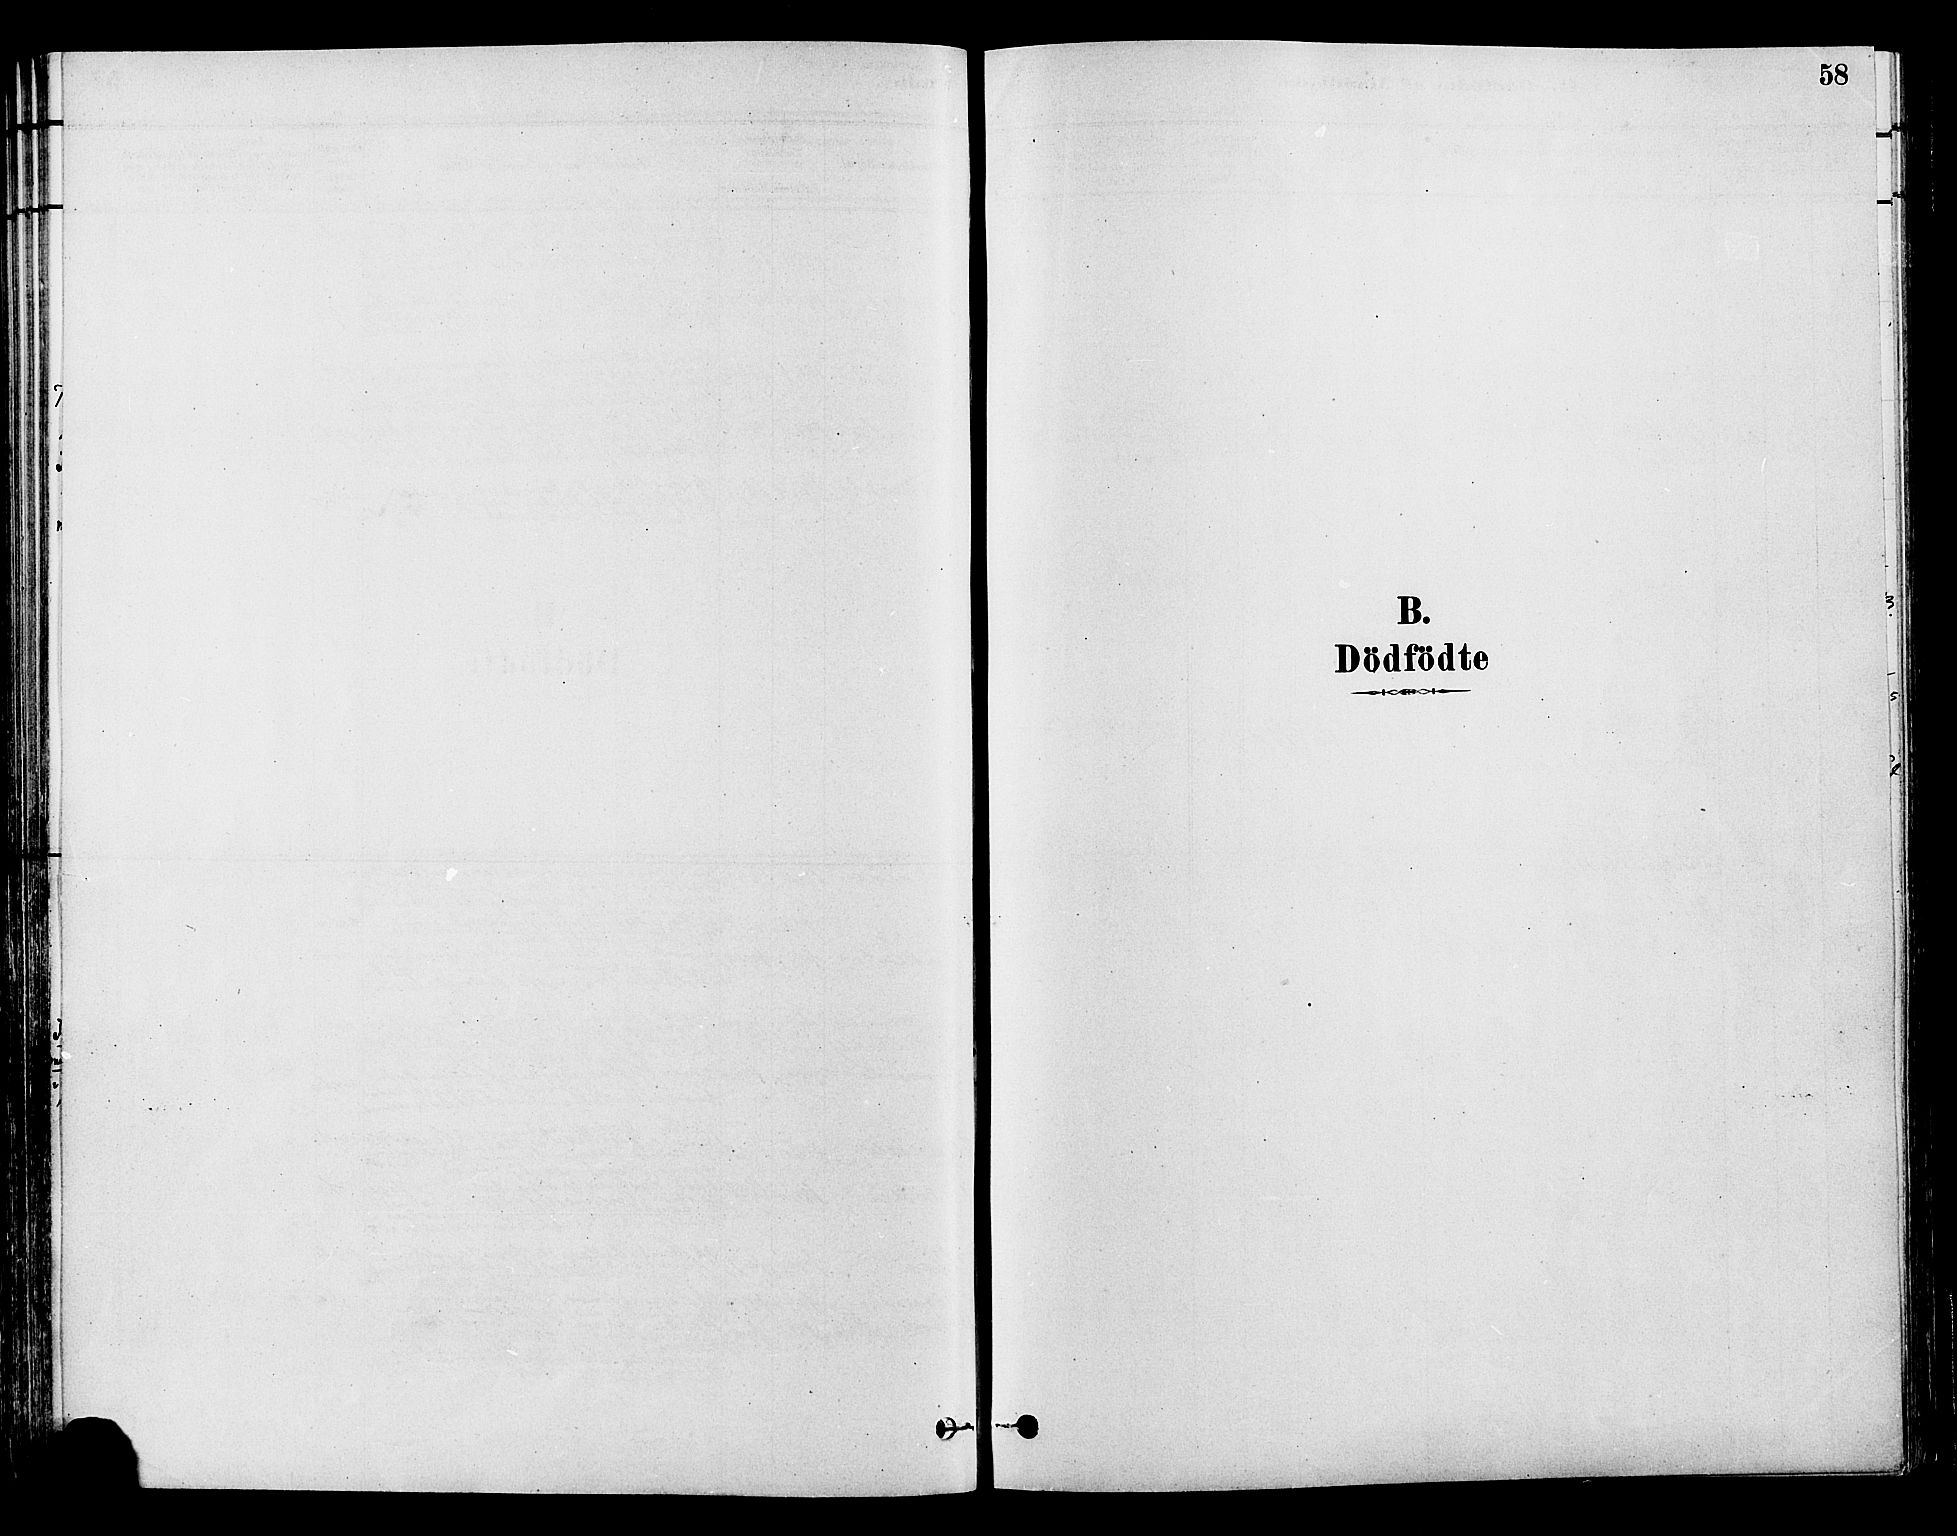 SAH, Gran prestekontor, Ministerialbok nr. 15, 1880-1888, s. 58